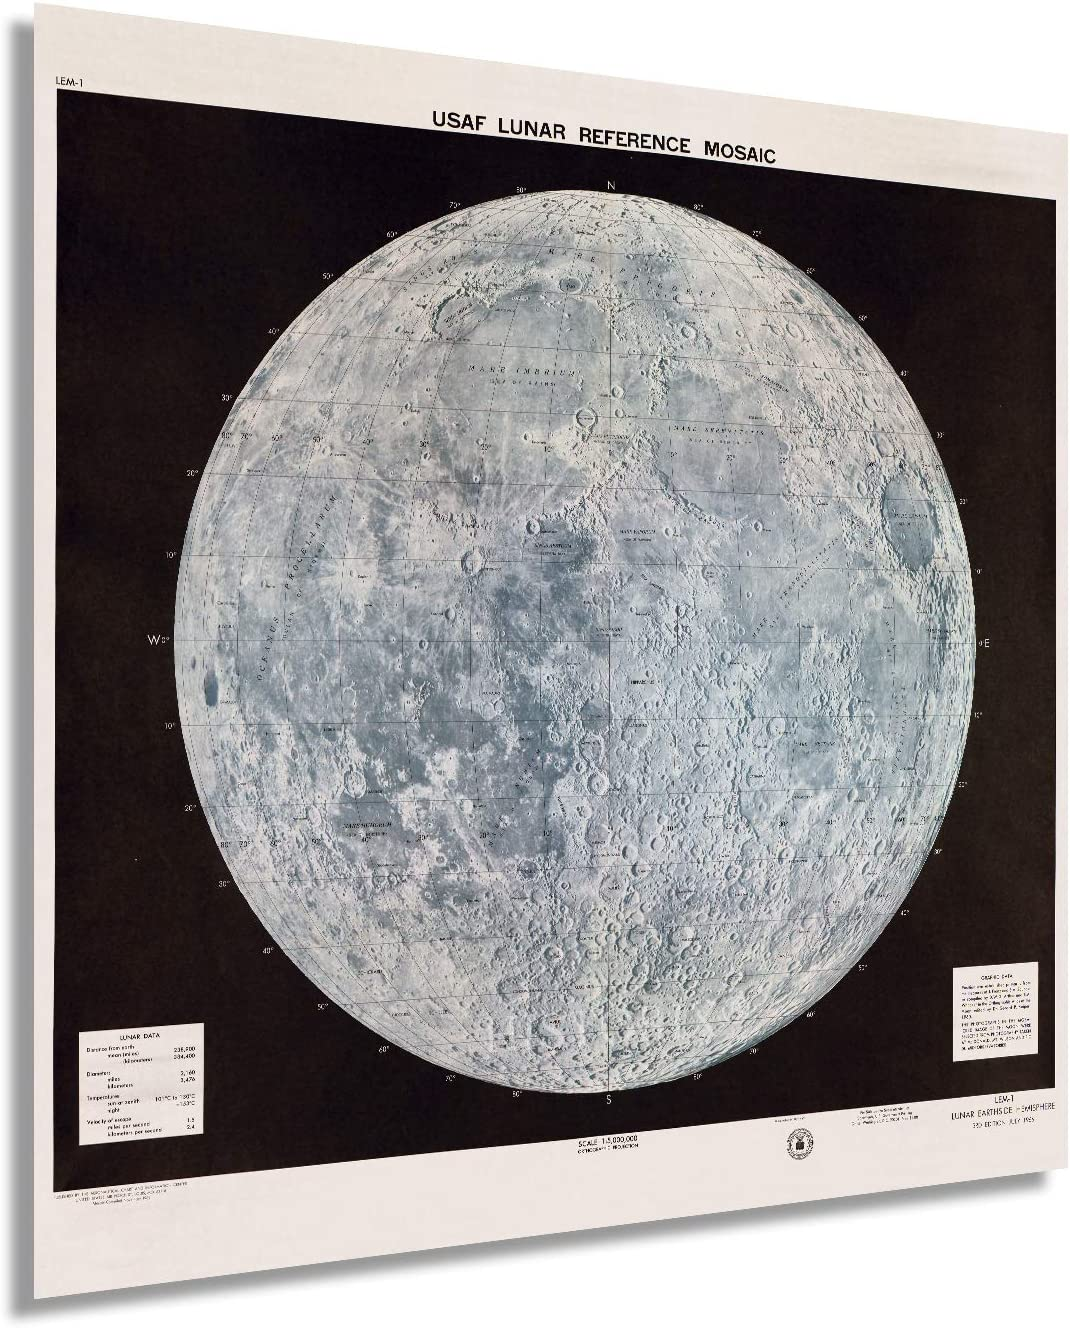 Historix Vintage 1966 Lunar Moon Map M Poster Max 73% OFF Japan Maker New Inch - 24x24